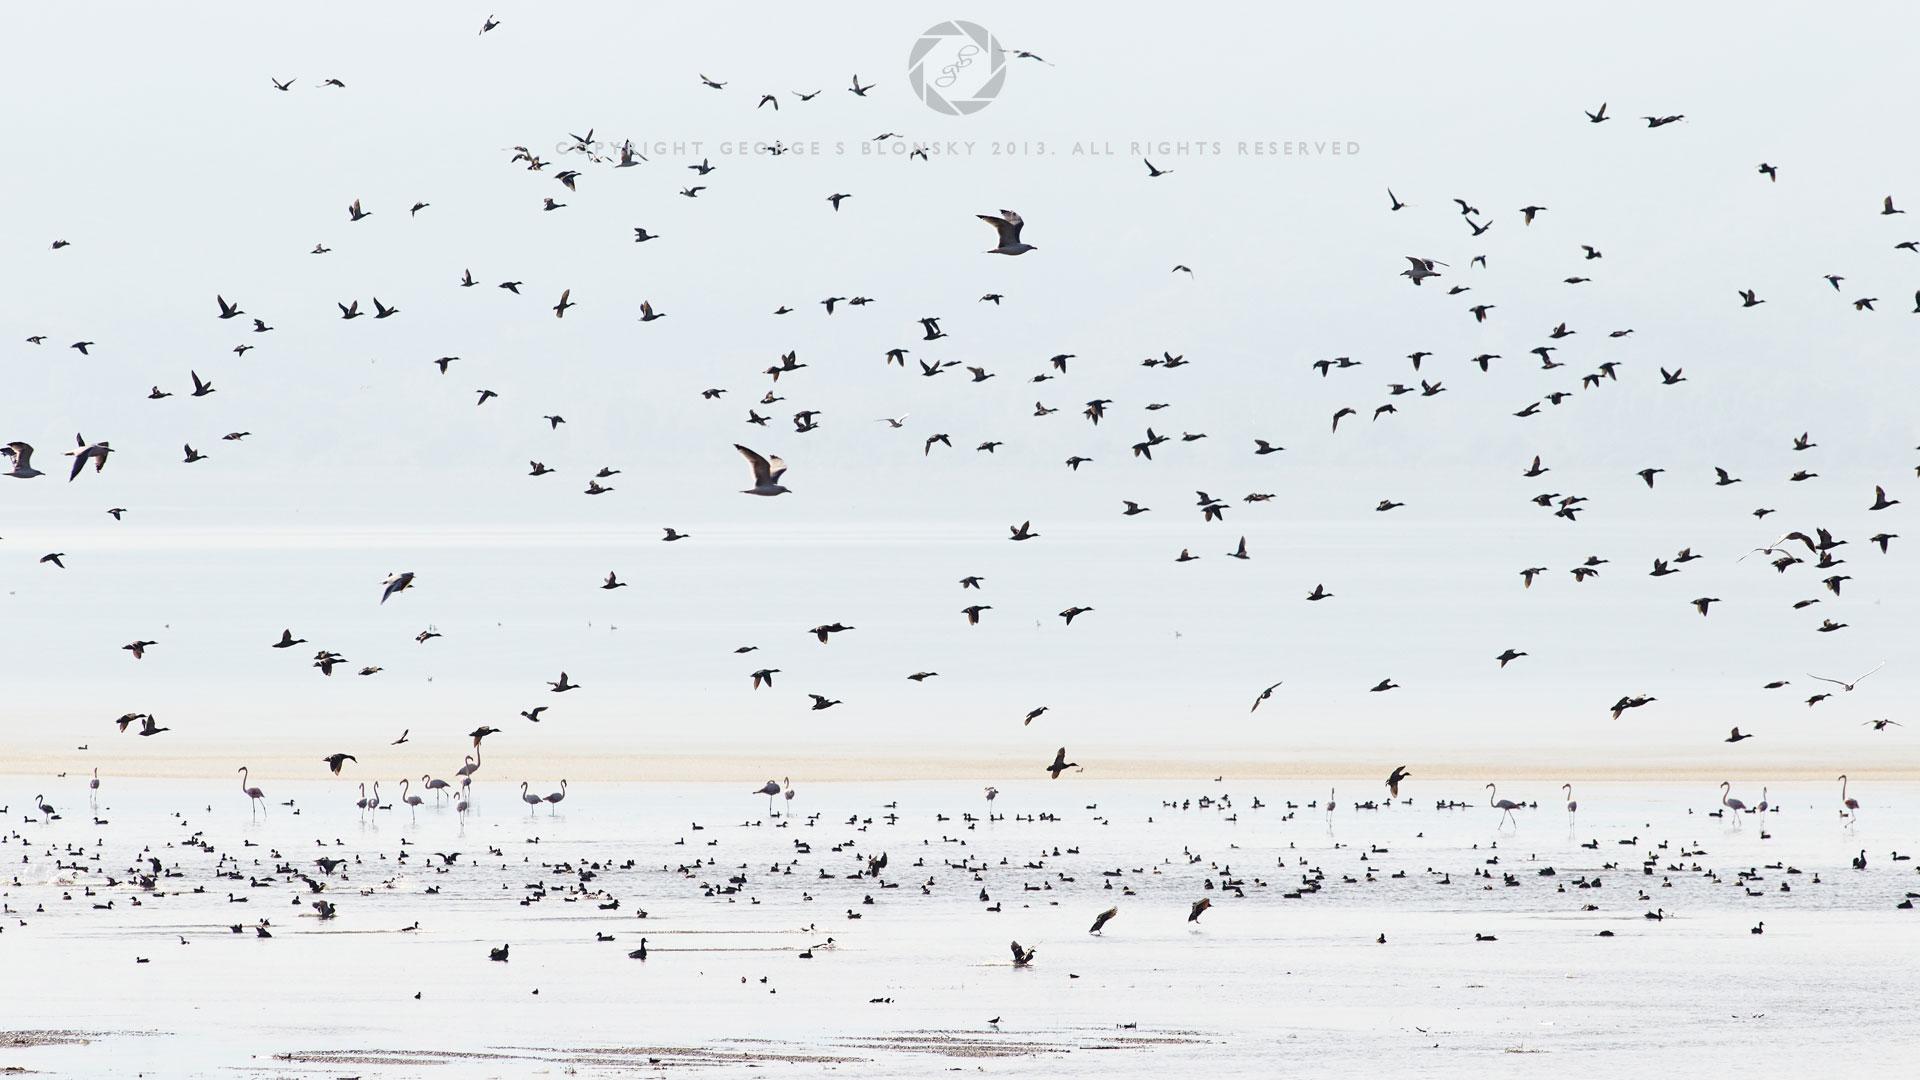 Waterbirds in flight over Lake Kerkini